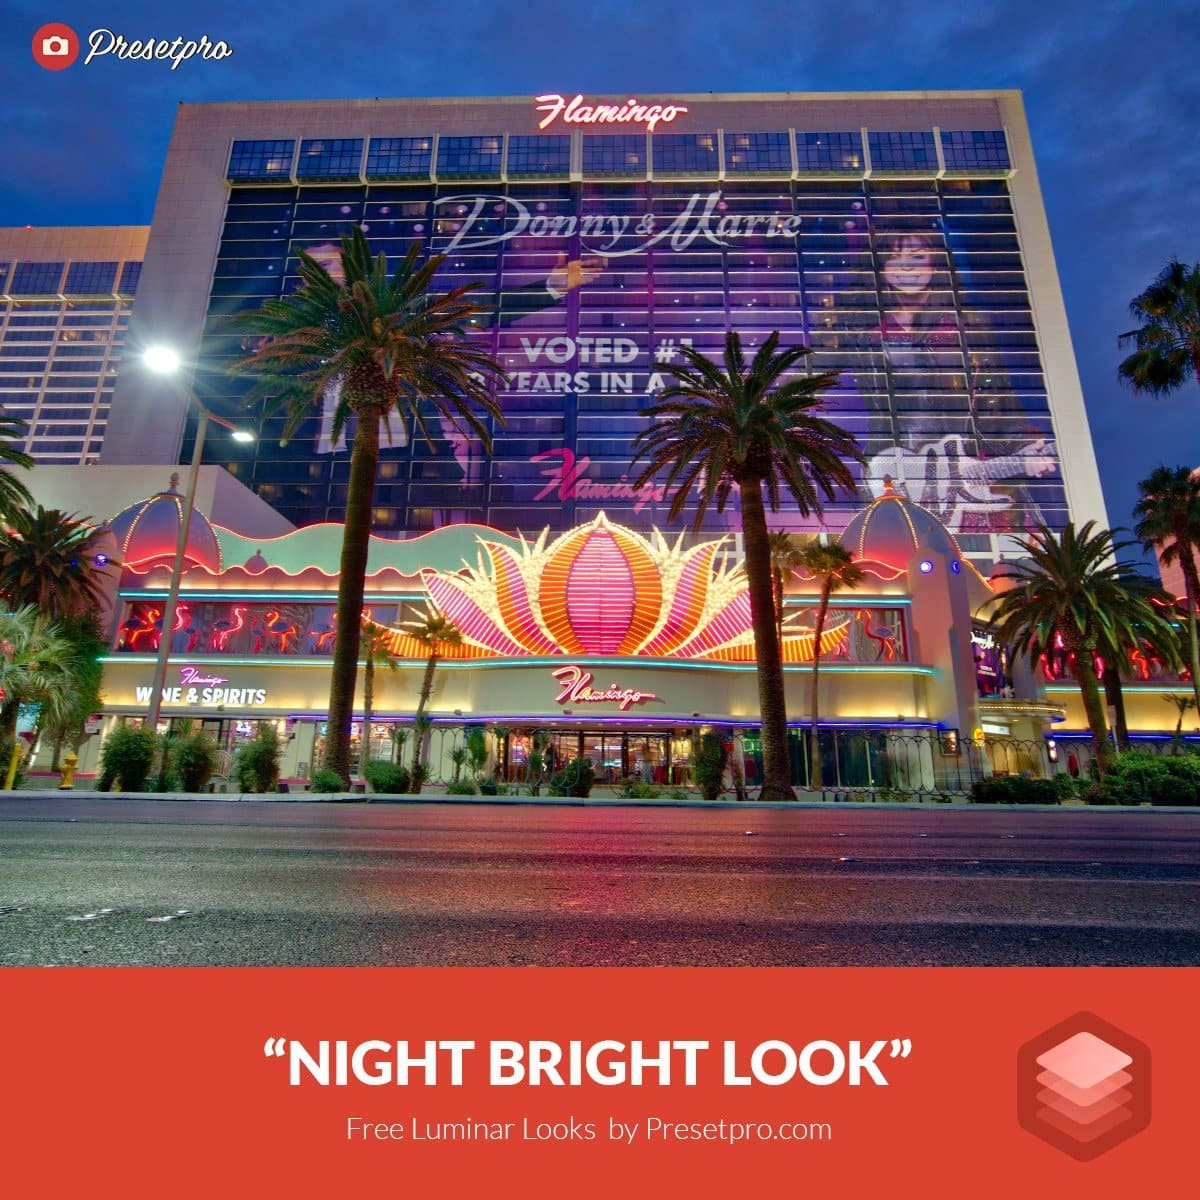 Free-Luminar-Look-Night-Bright-Preset-Presetpro.com